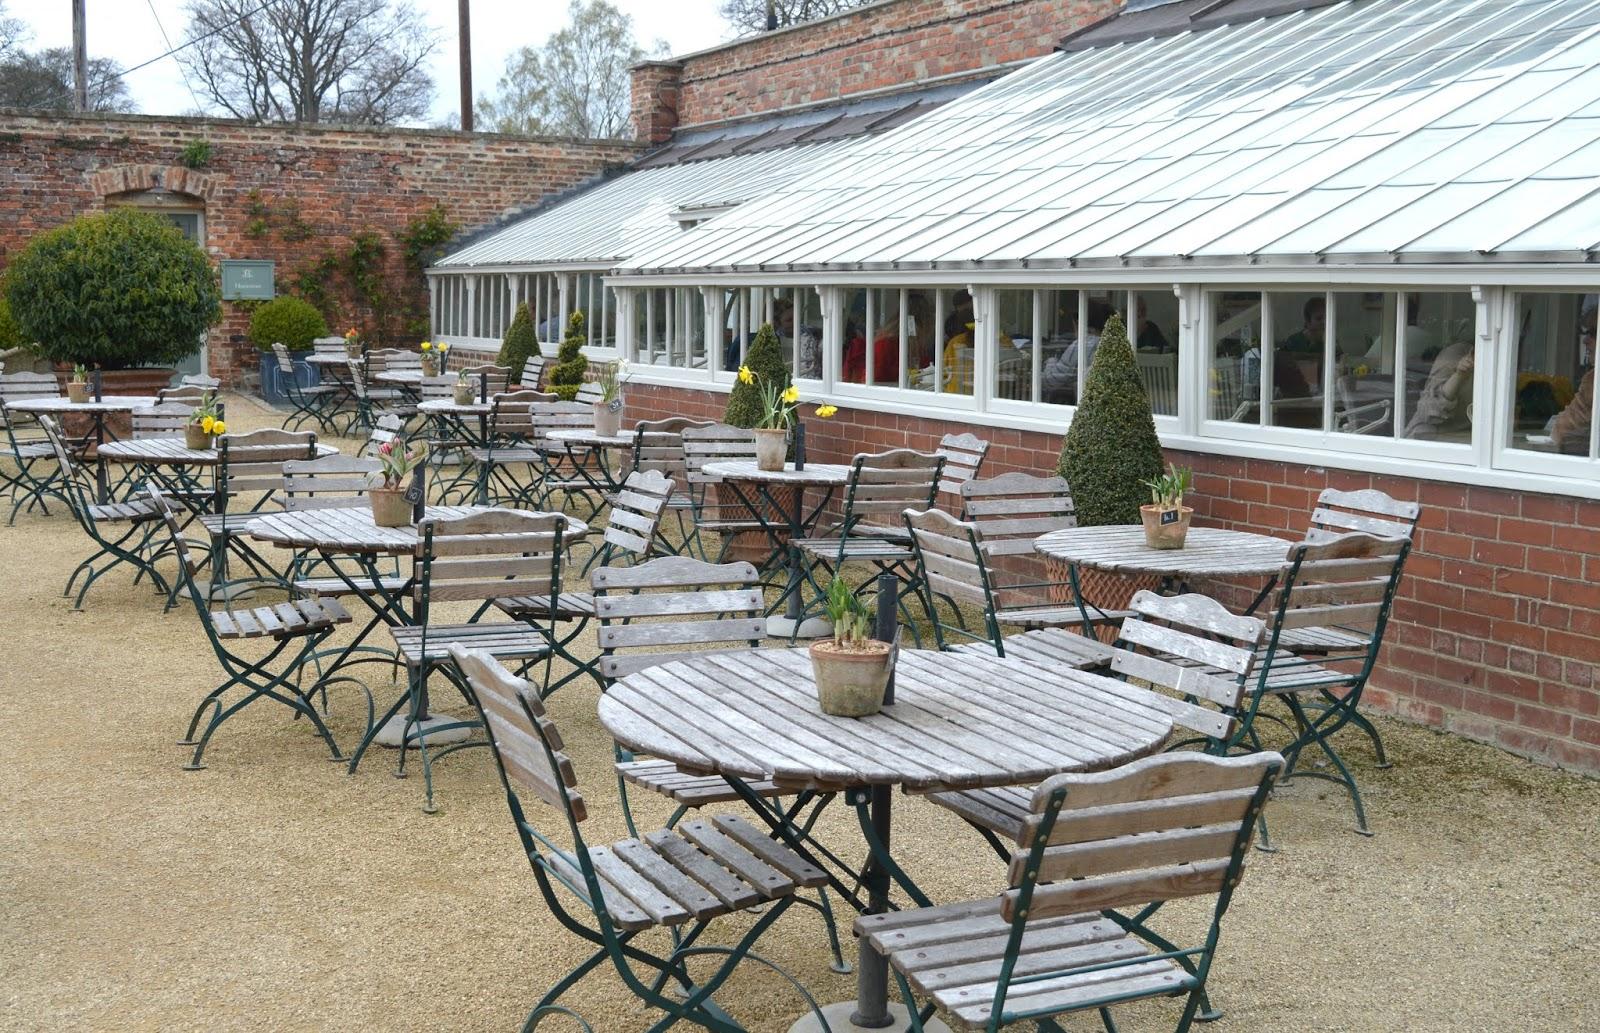 Bradley Gardens Wylam Glasshouse Cafe